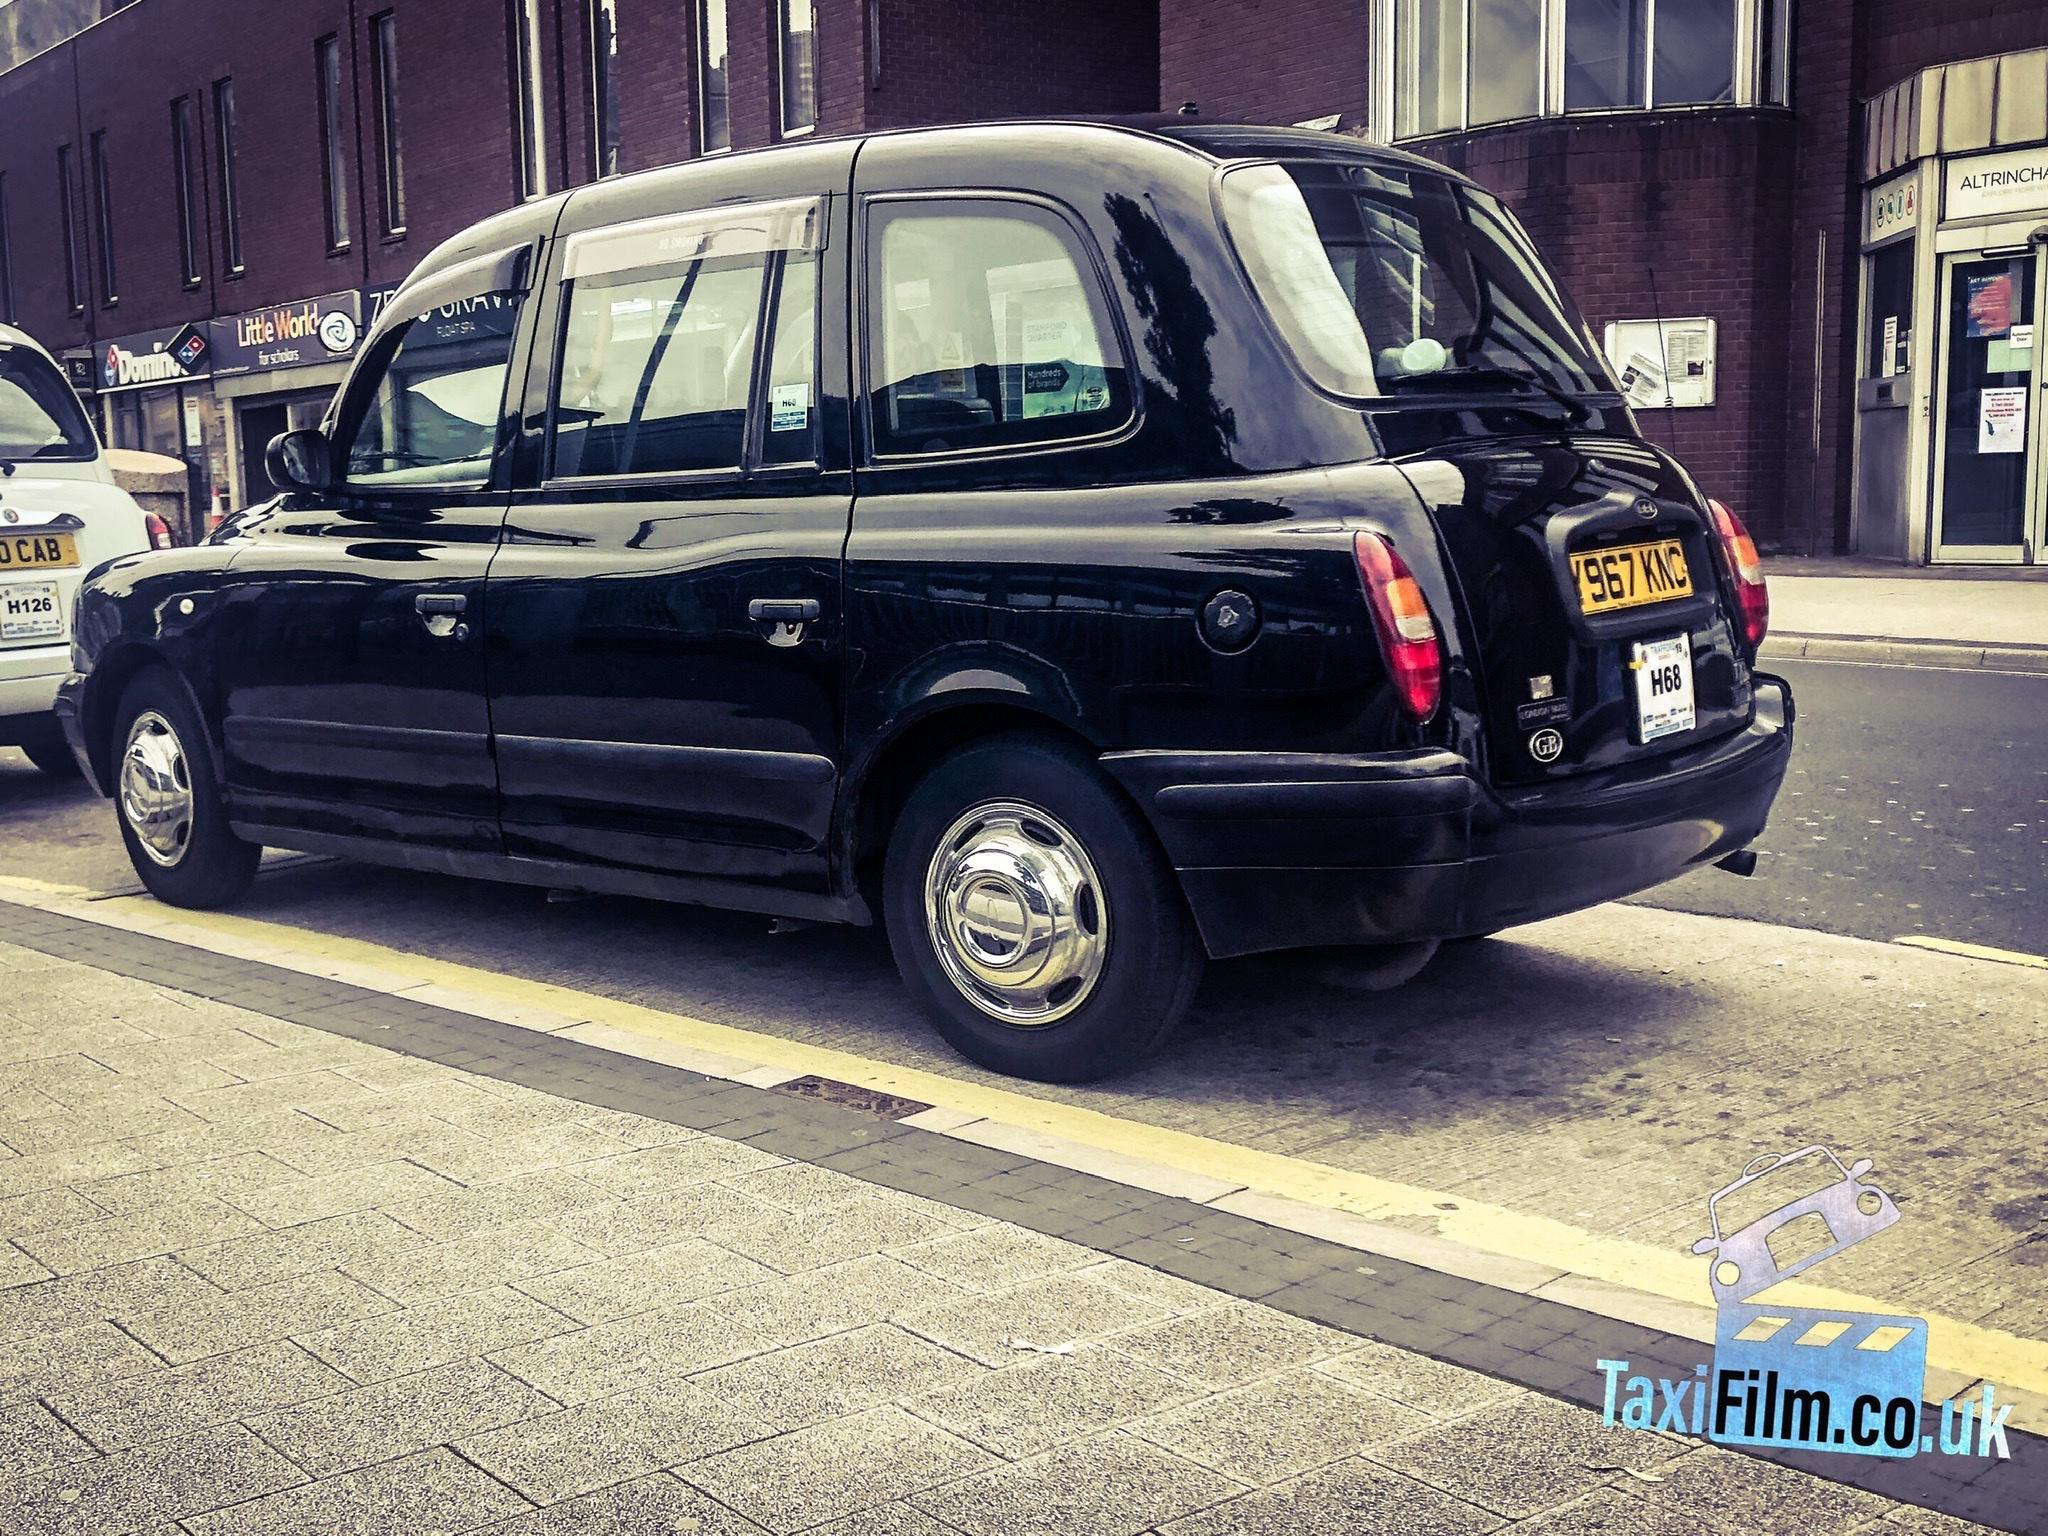 Black Tx1 Taxi, 2001, Manchester ref M0005